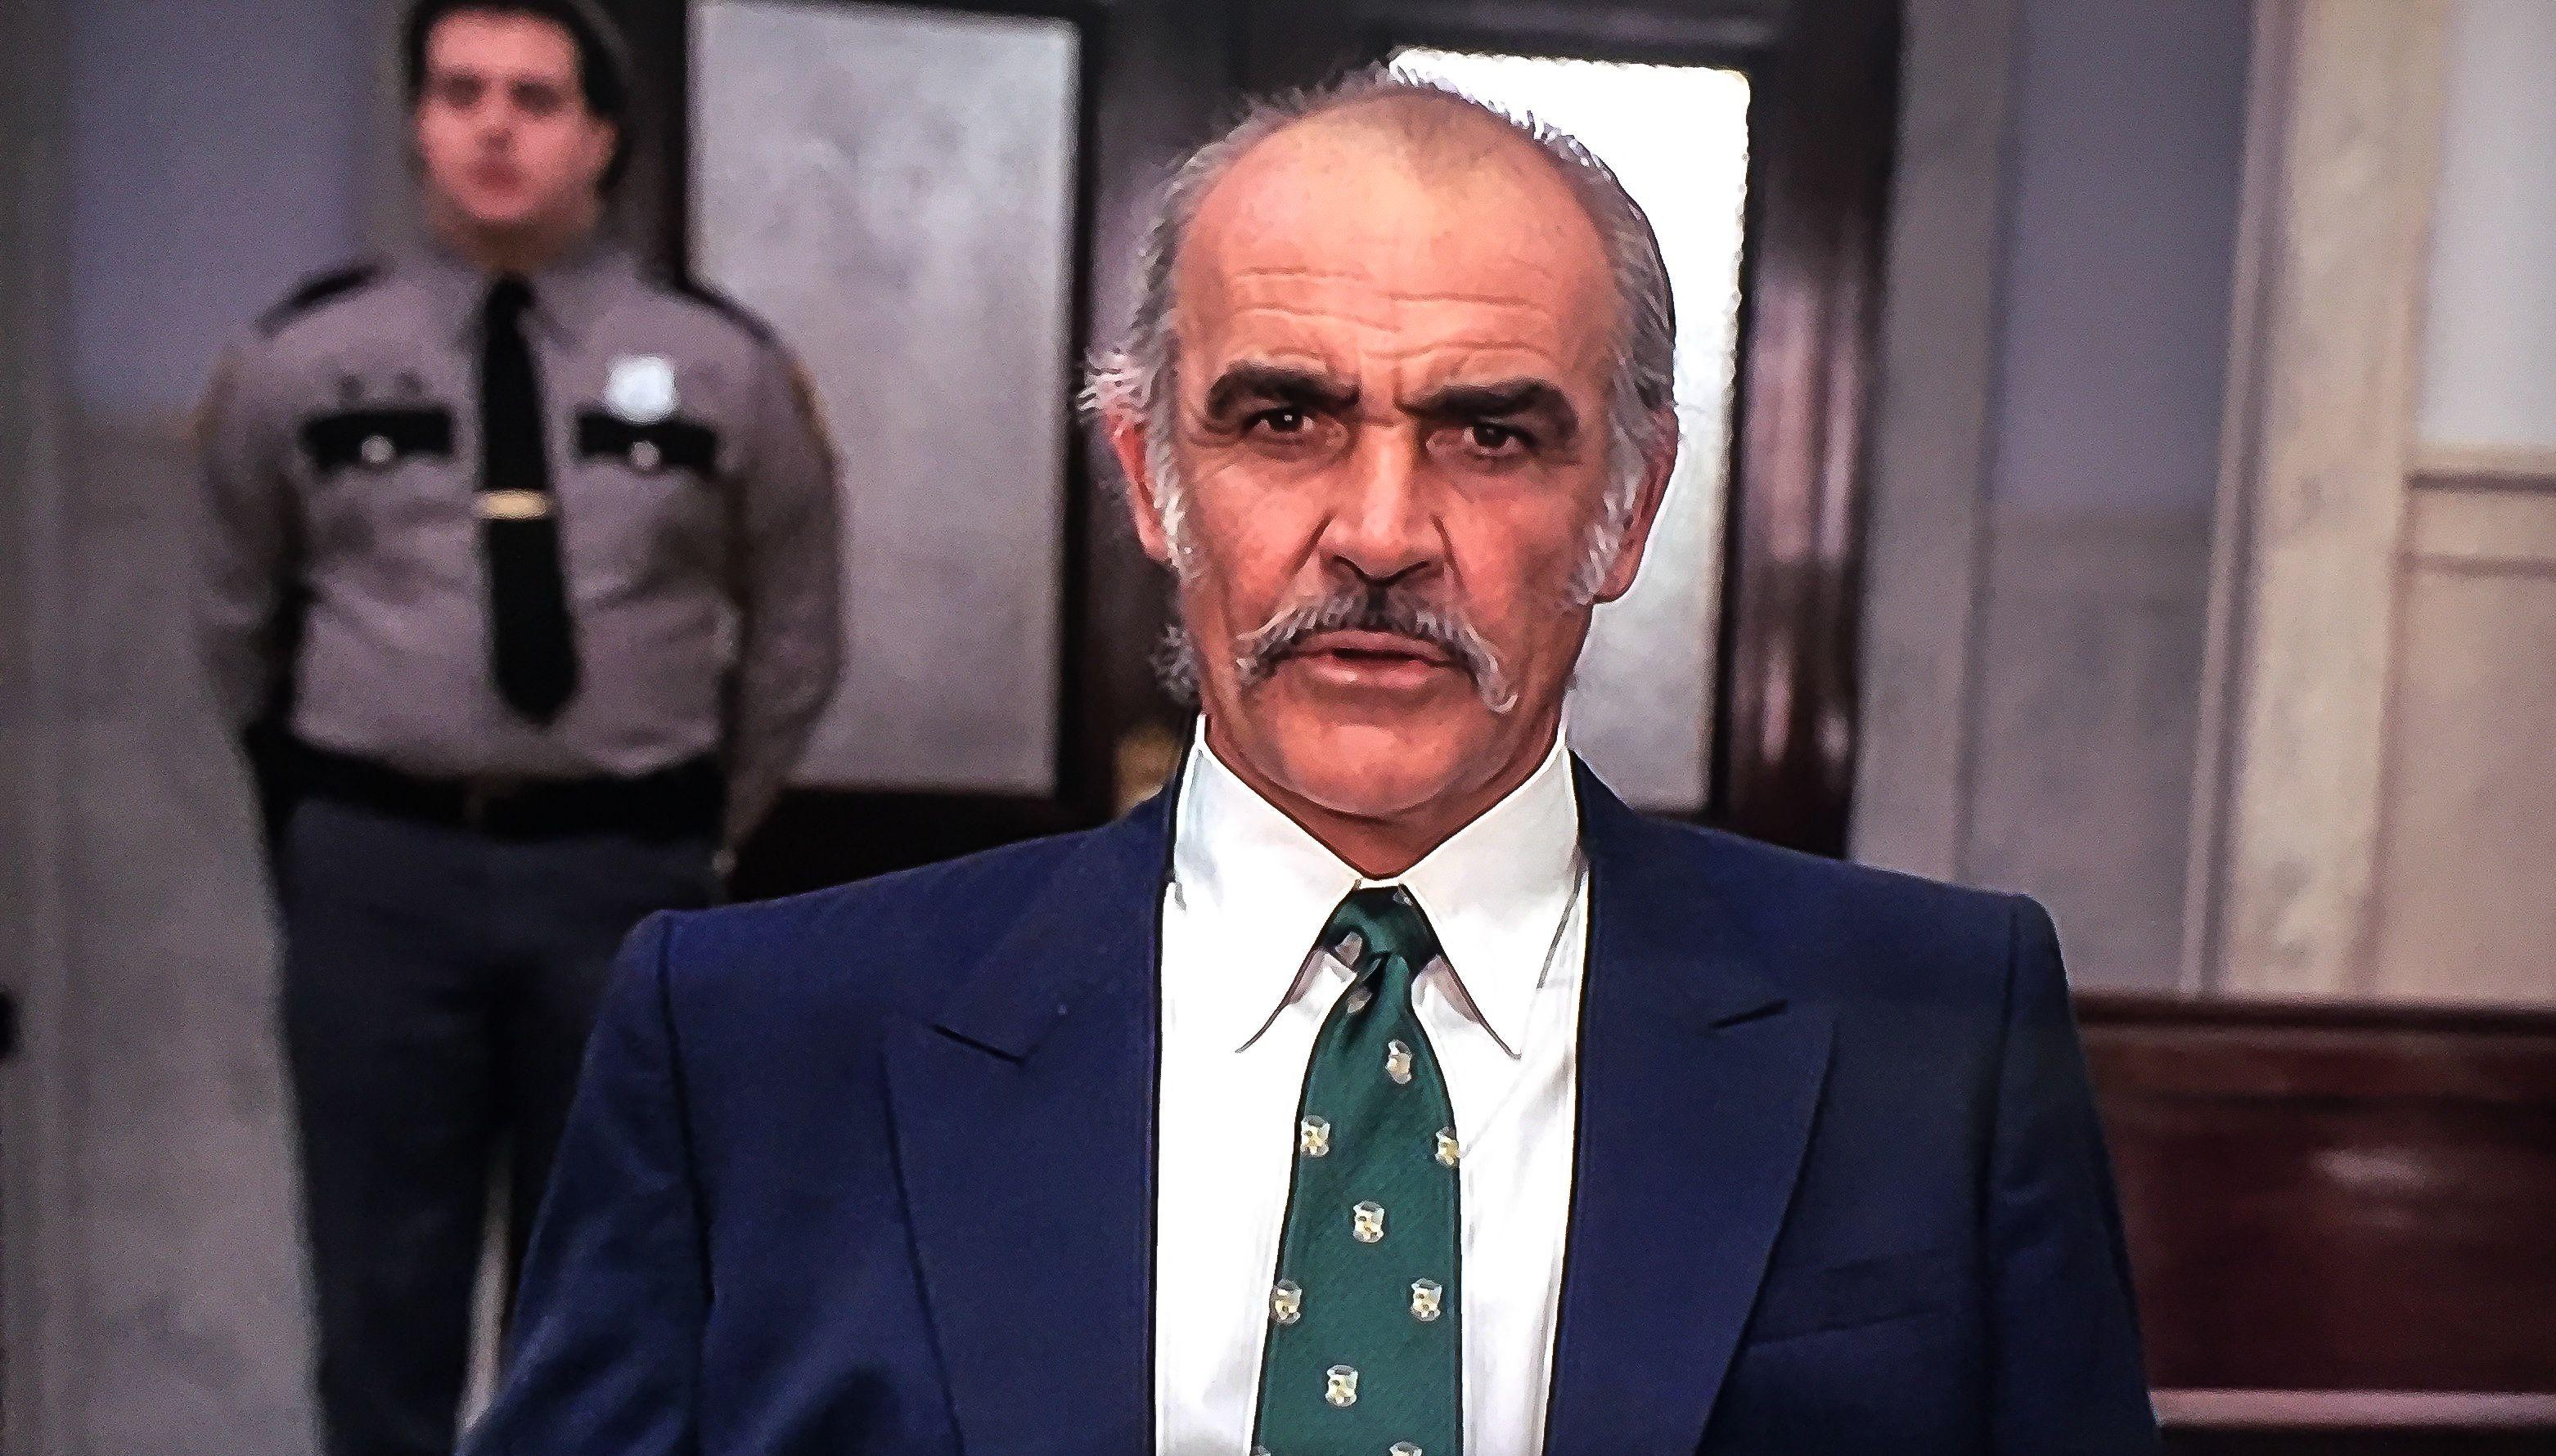 Sean Connery Peak Lapel in 2020 Family business, Sean